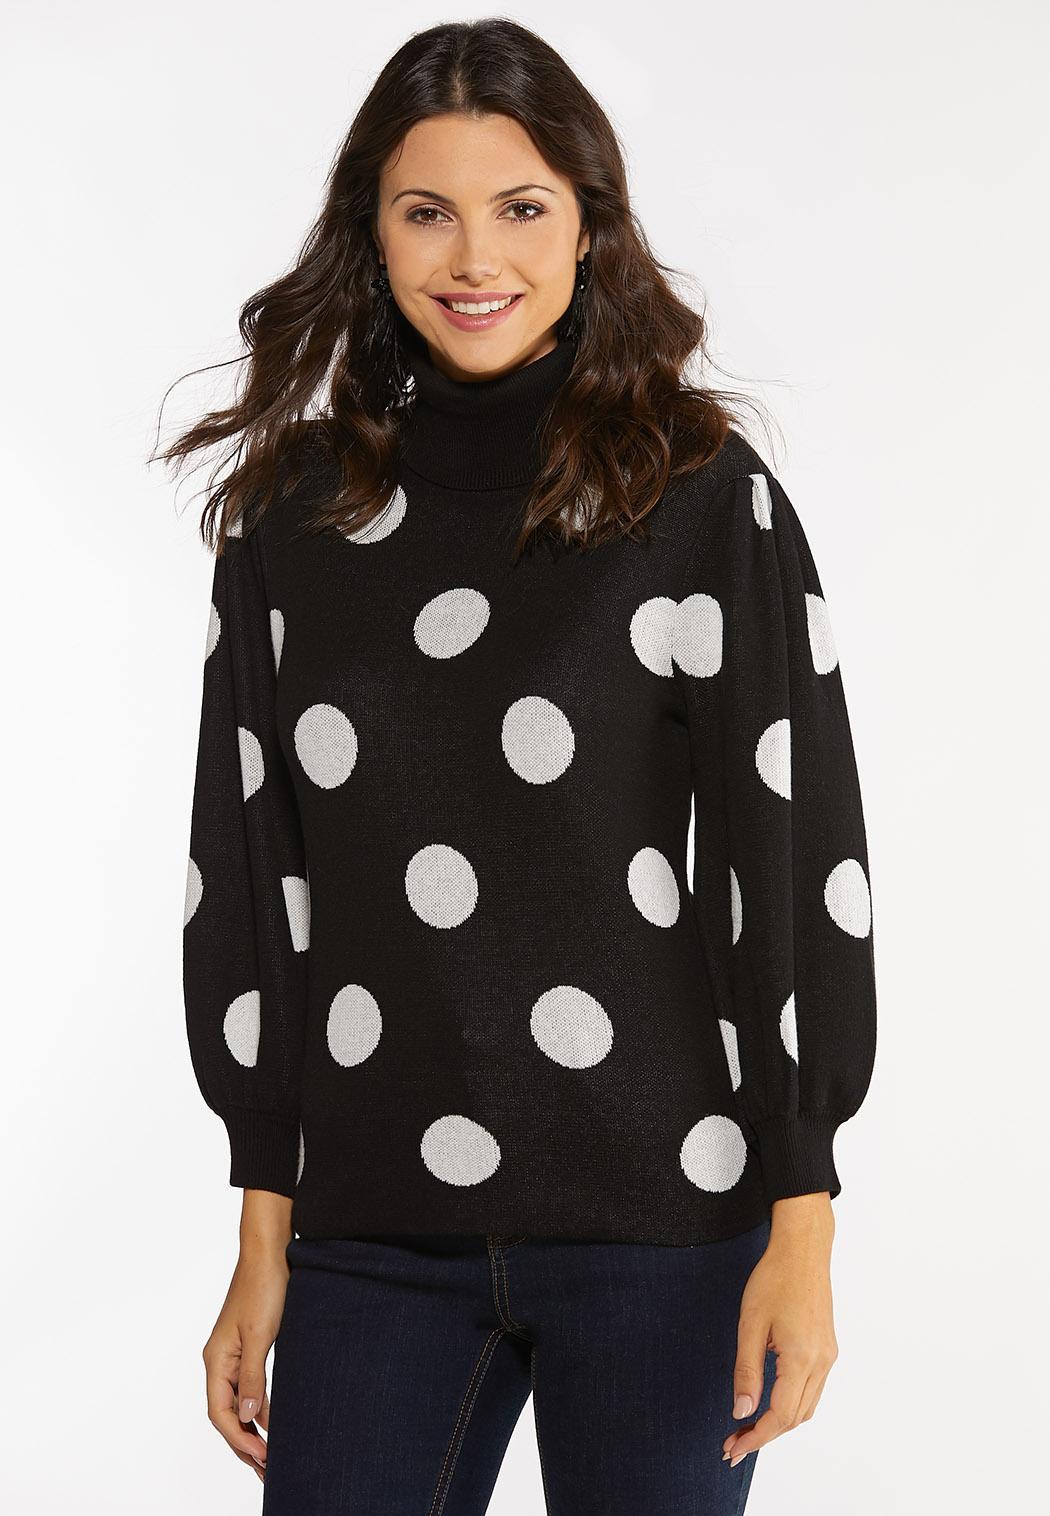 Polka Dot Puff Sleeve Sweater